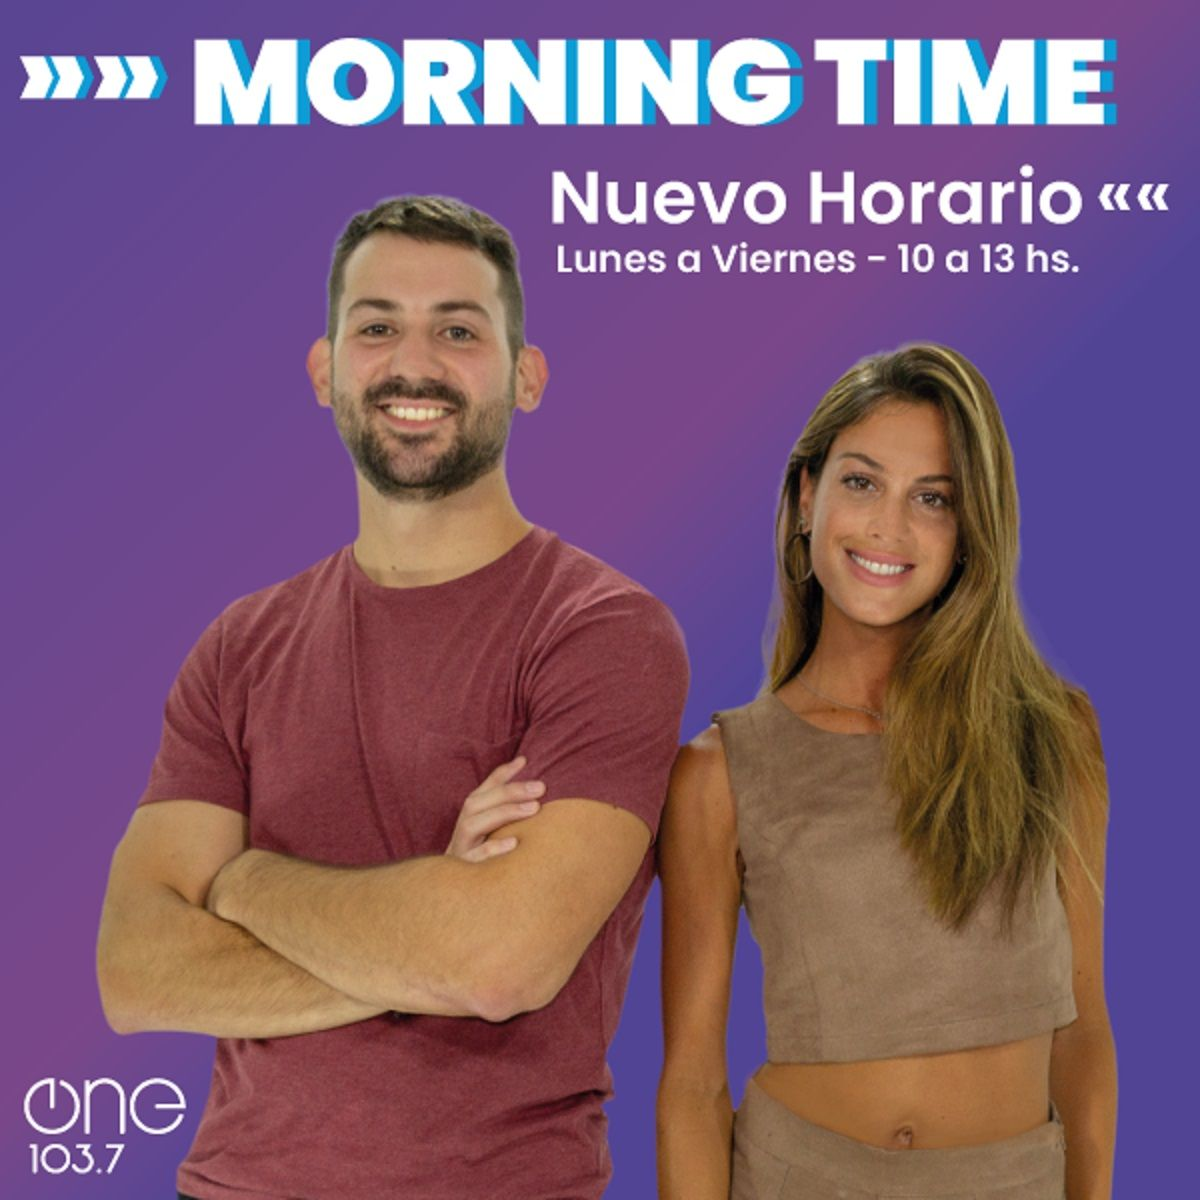 Nuevo horario para Morning Time en One 103.7